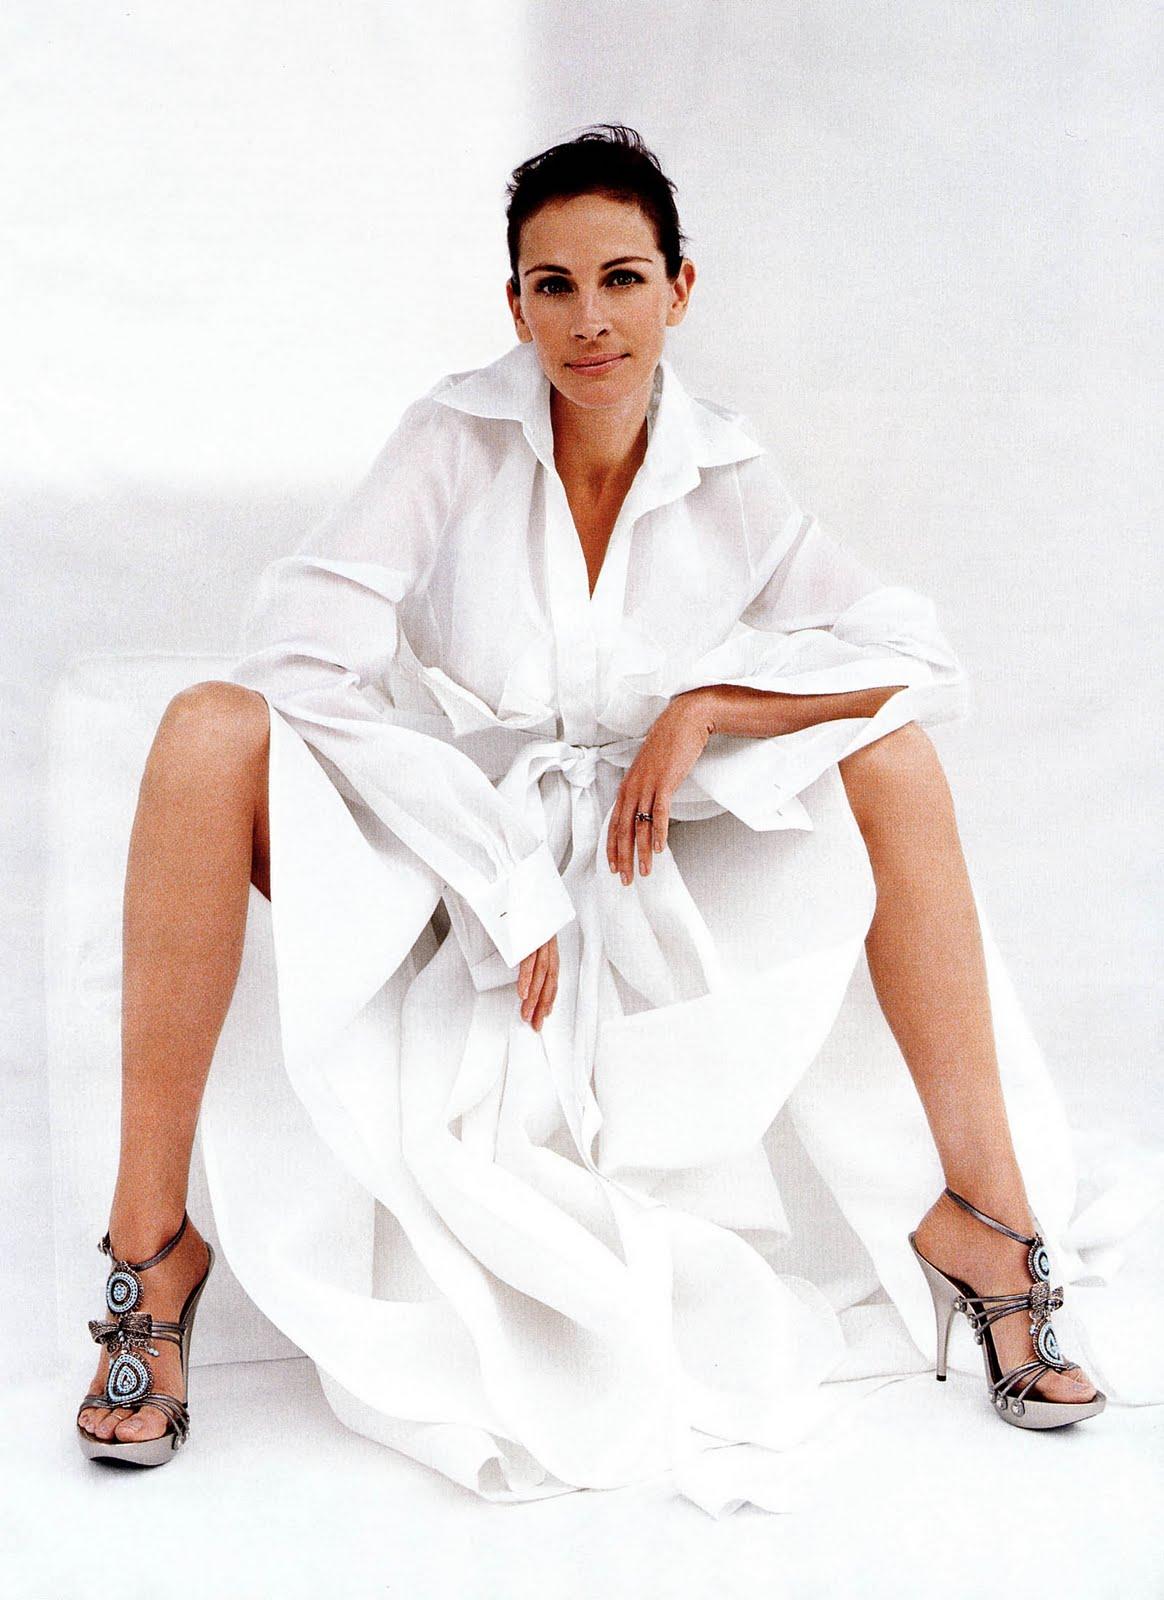 http://1.bp.blogspot.com/_bQ0SqifjNcg/TD_qQOLnExI/AAAAAAAAYa8/Cq_3zdelRCU/s1600/julia-roberts-feet-3.jpg